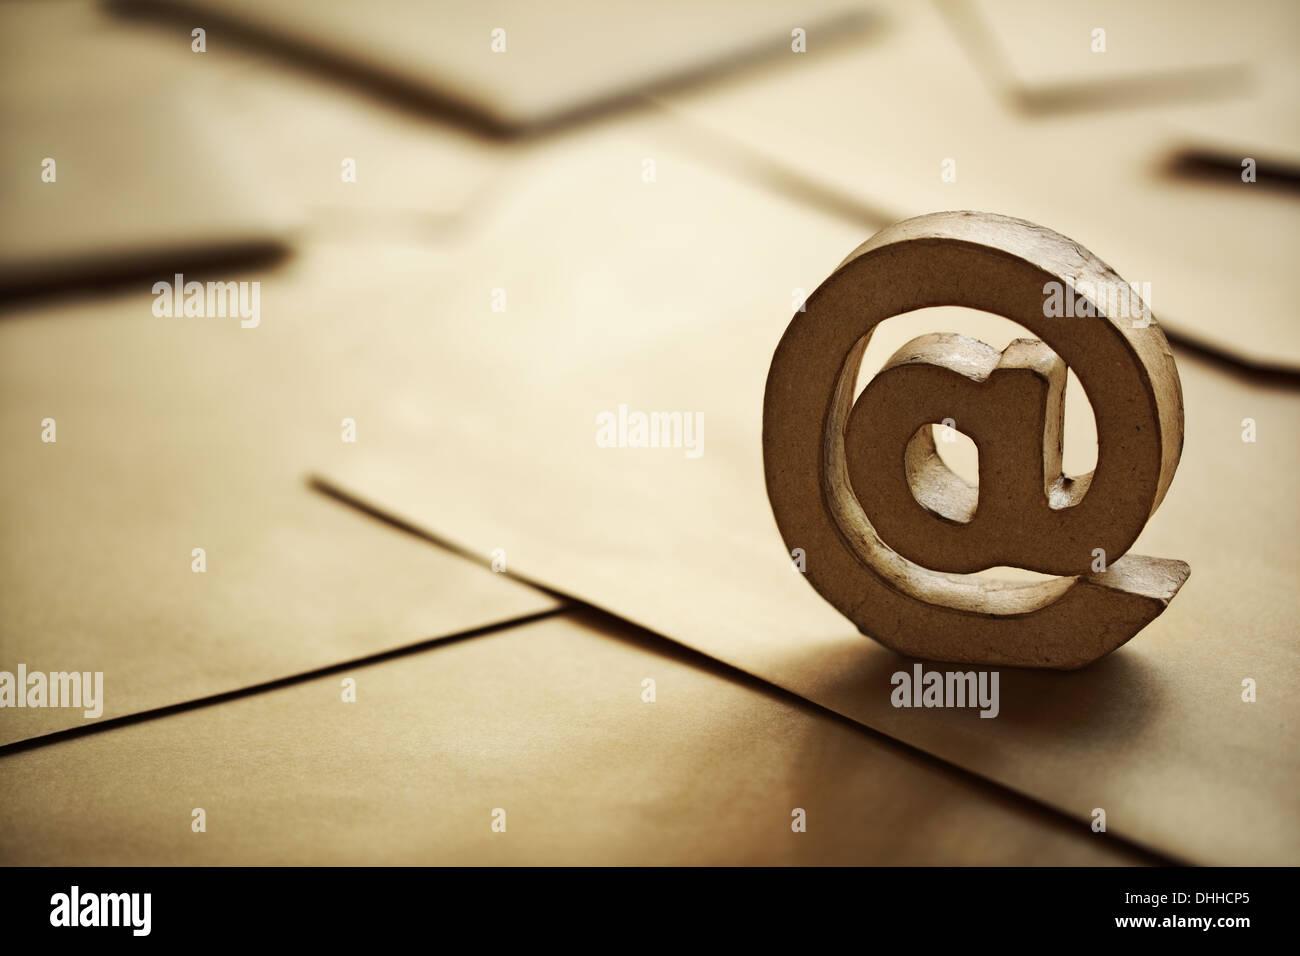 Courriel @ symbole Photo Stock